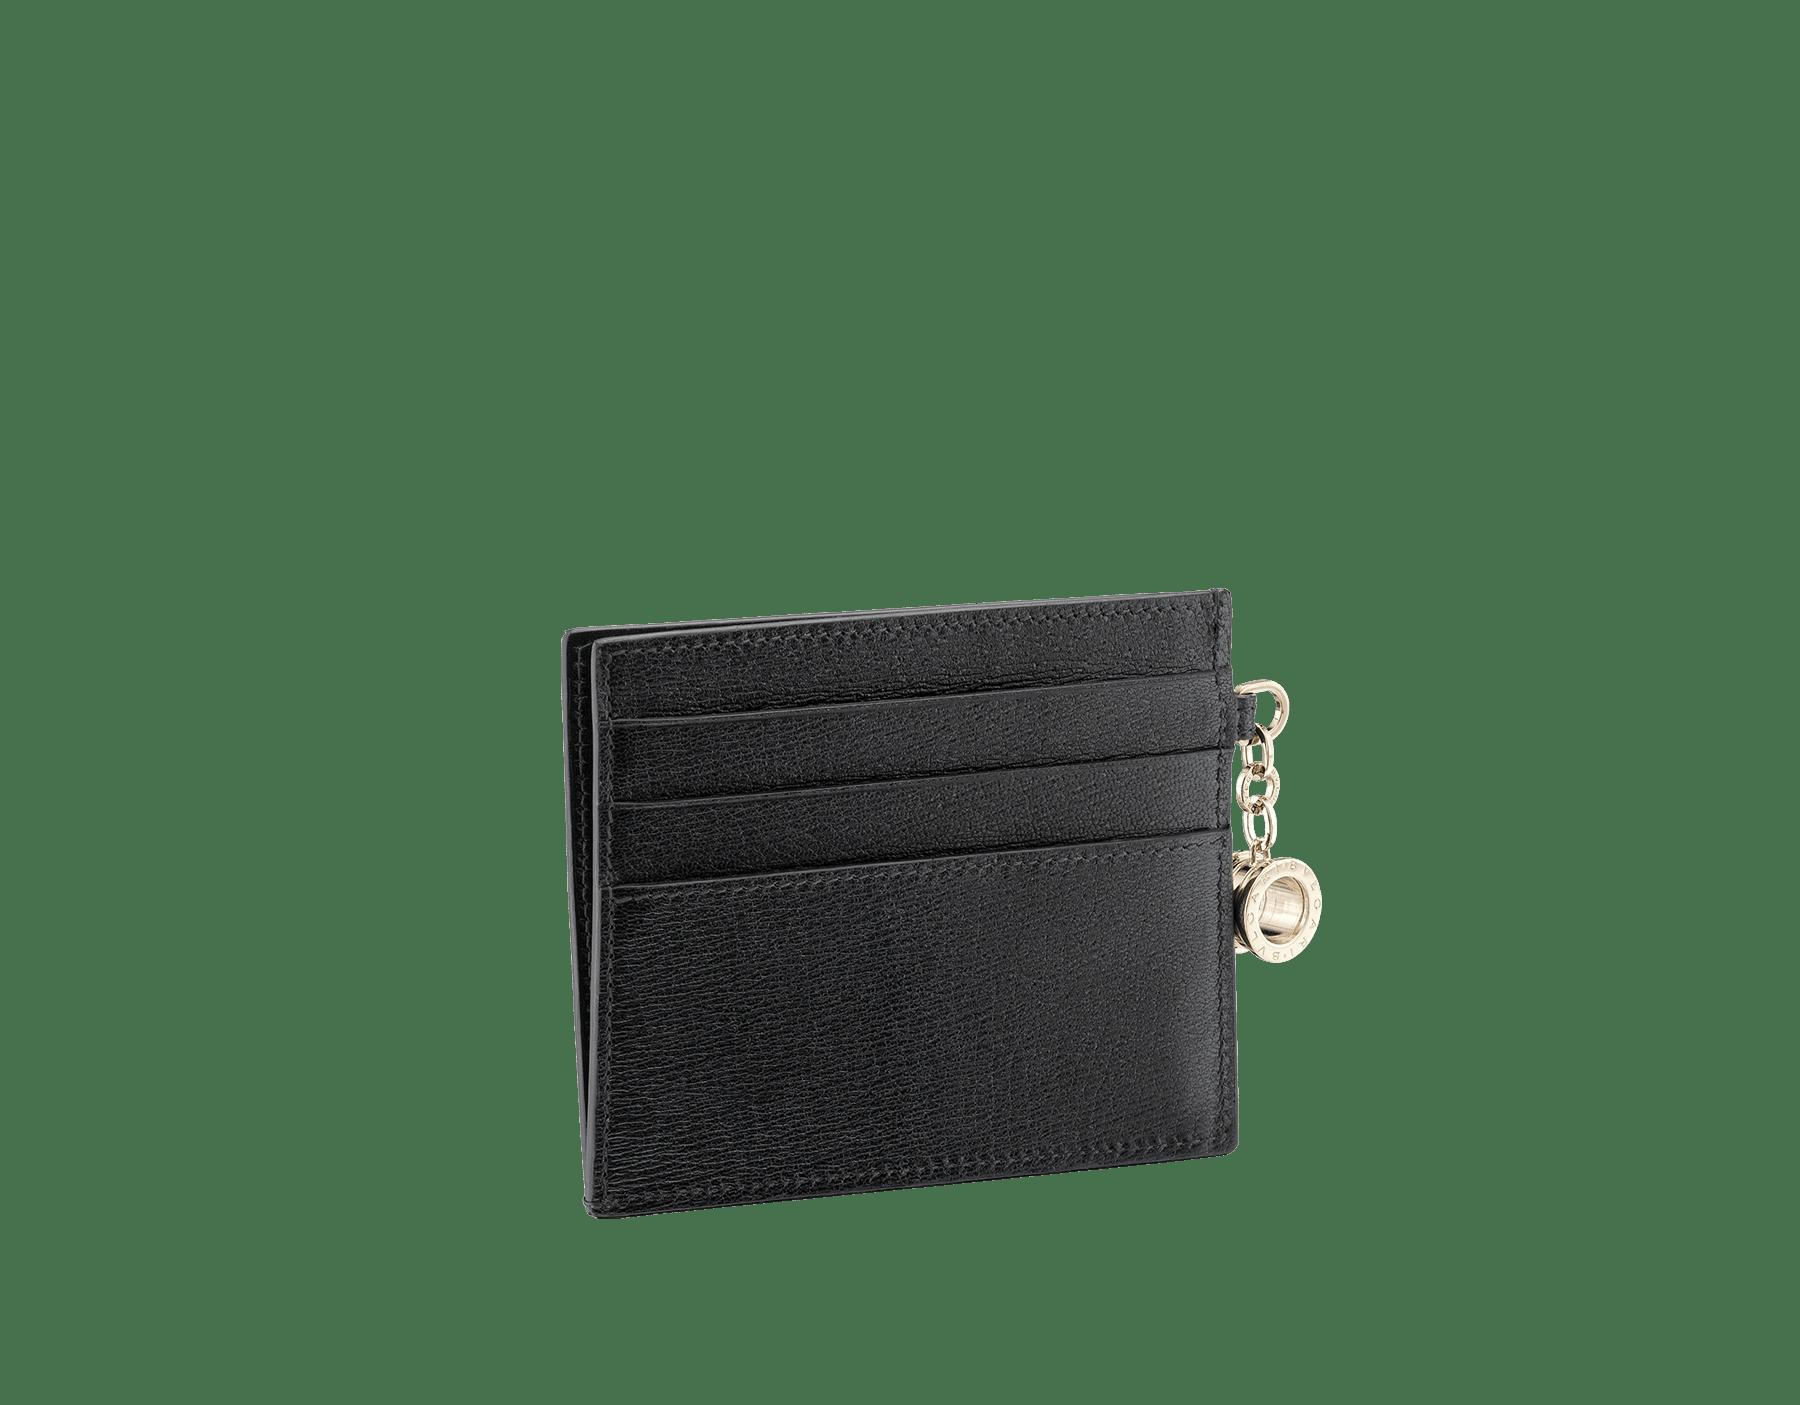 B.zero1 open credit card holder in black goatskin. Iconic B.zero1 charm in light gold plated brass. 288232 image 1